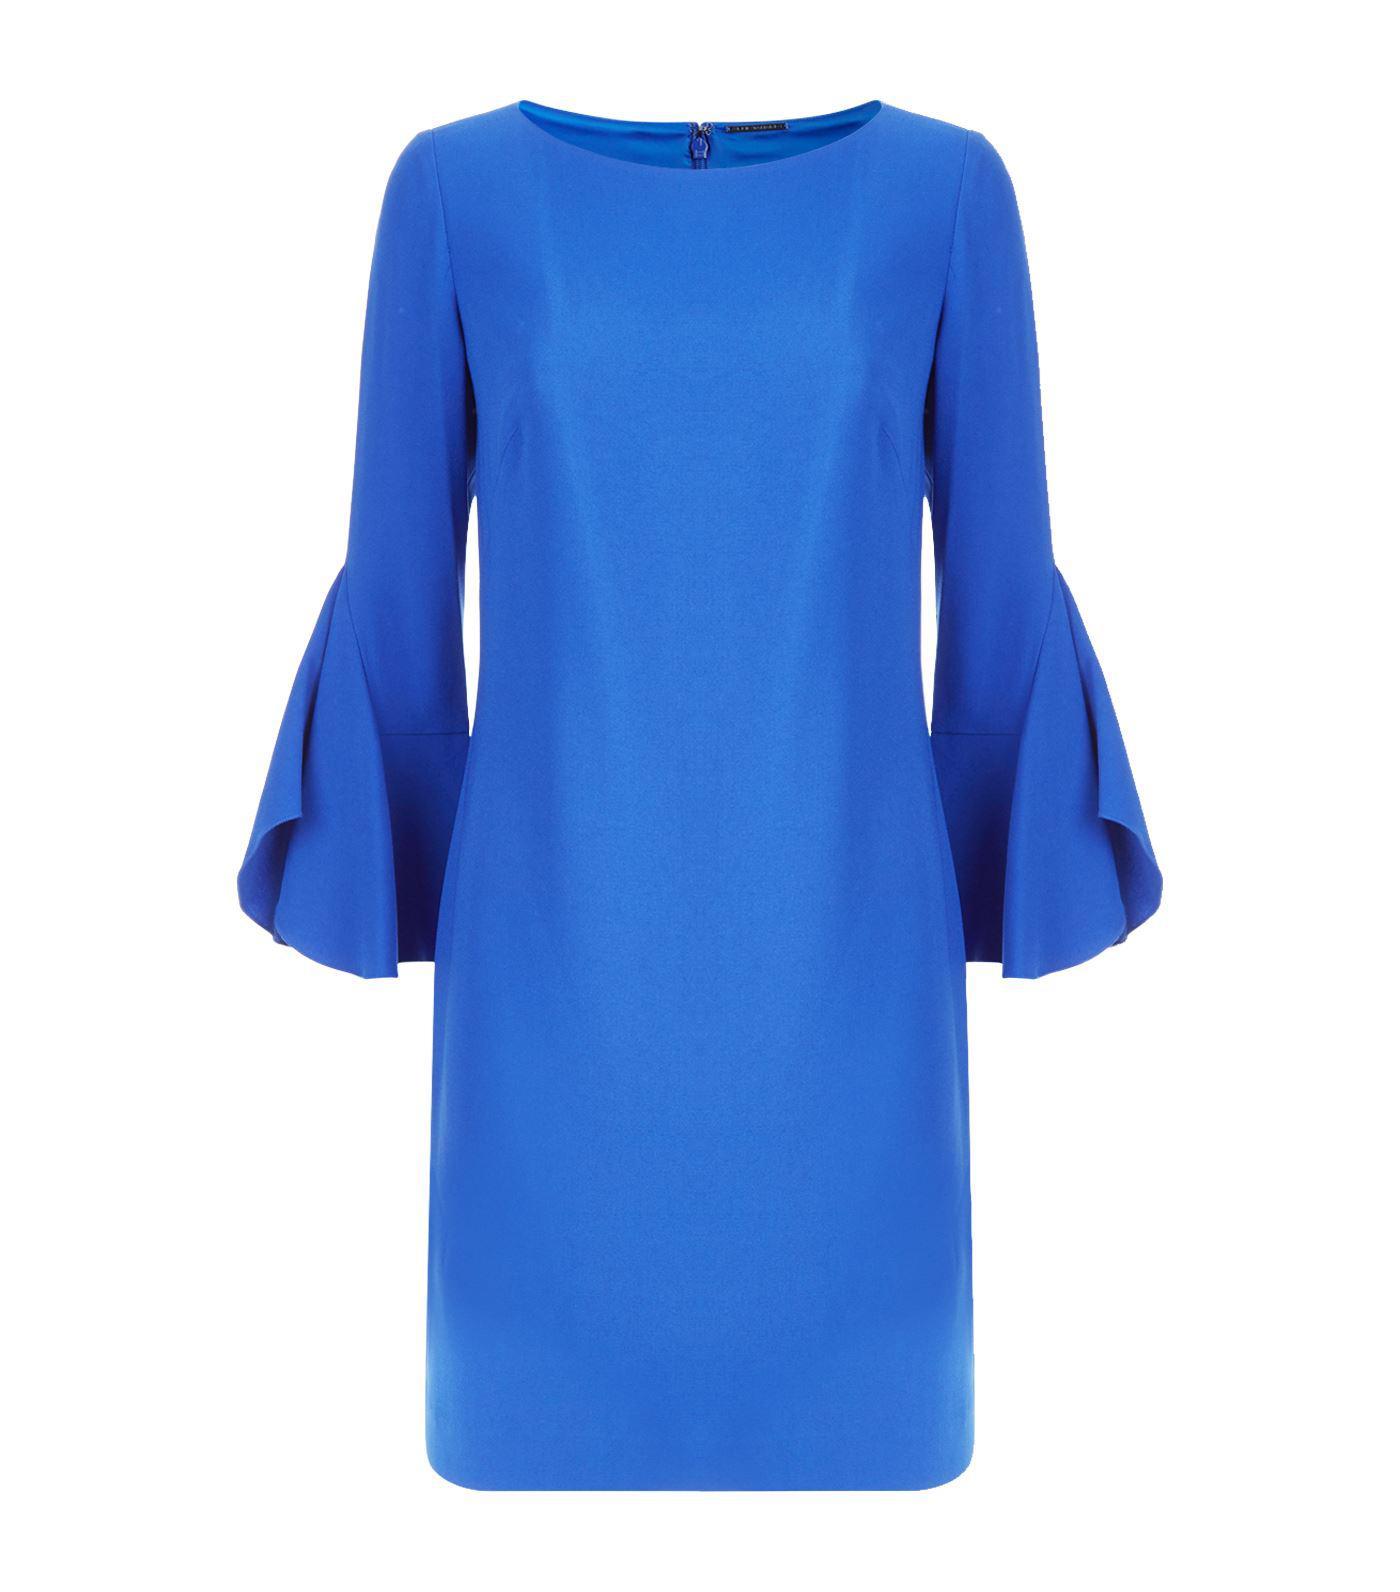 aff8a17b7a10 Elie Tahari. Women's Blue Dori Boat-neck Flared-sleeve Crepe A-line Dress